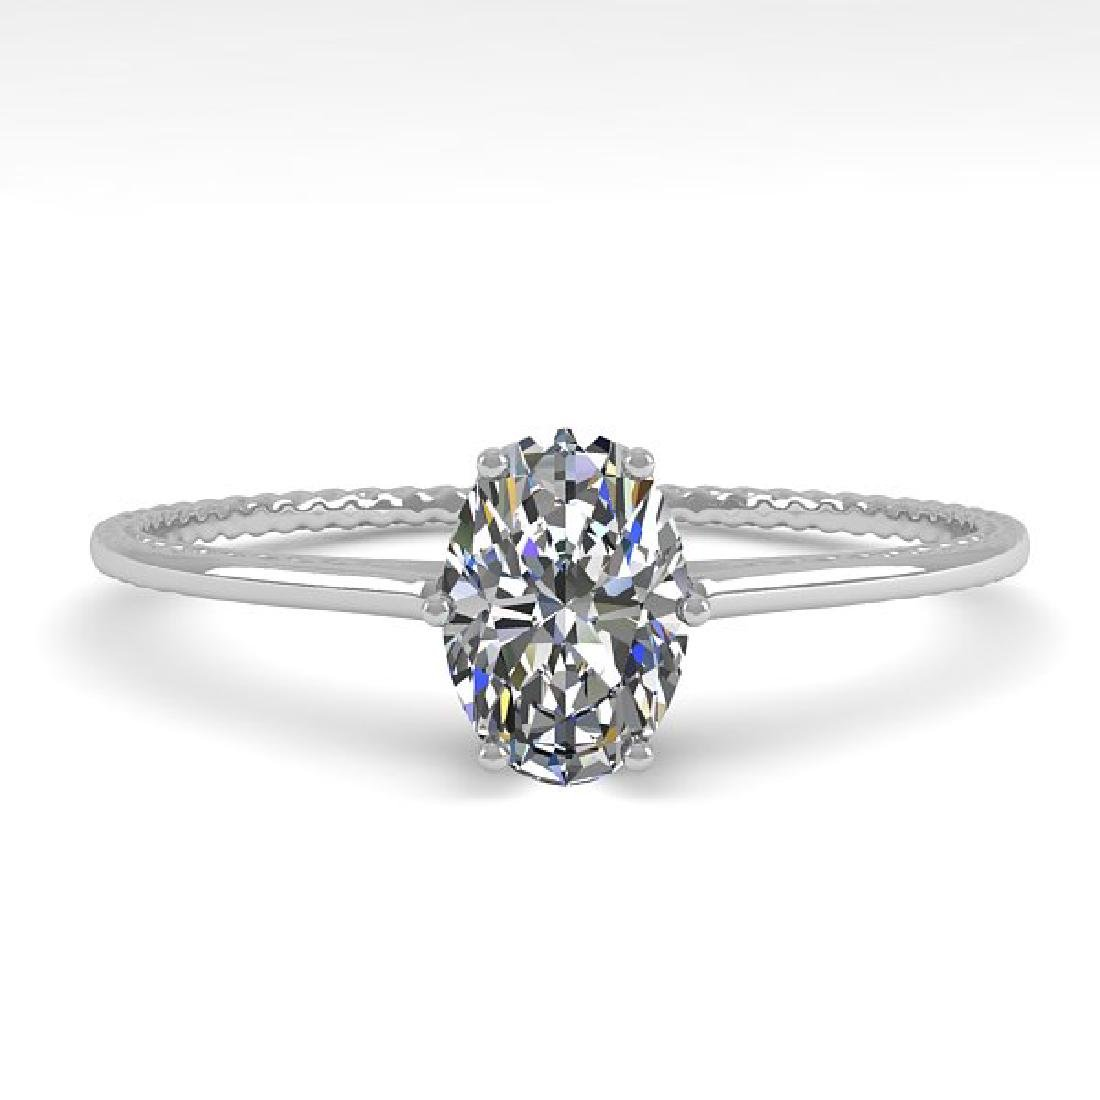 1.0 CTW VS/SI Oval Cut Diamond Art Deco Ring 14K White